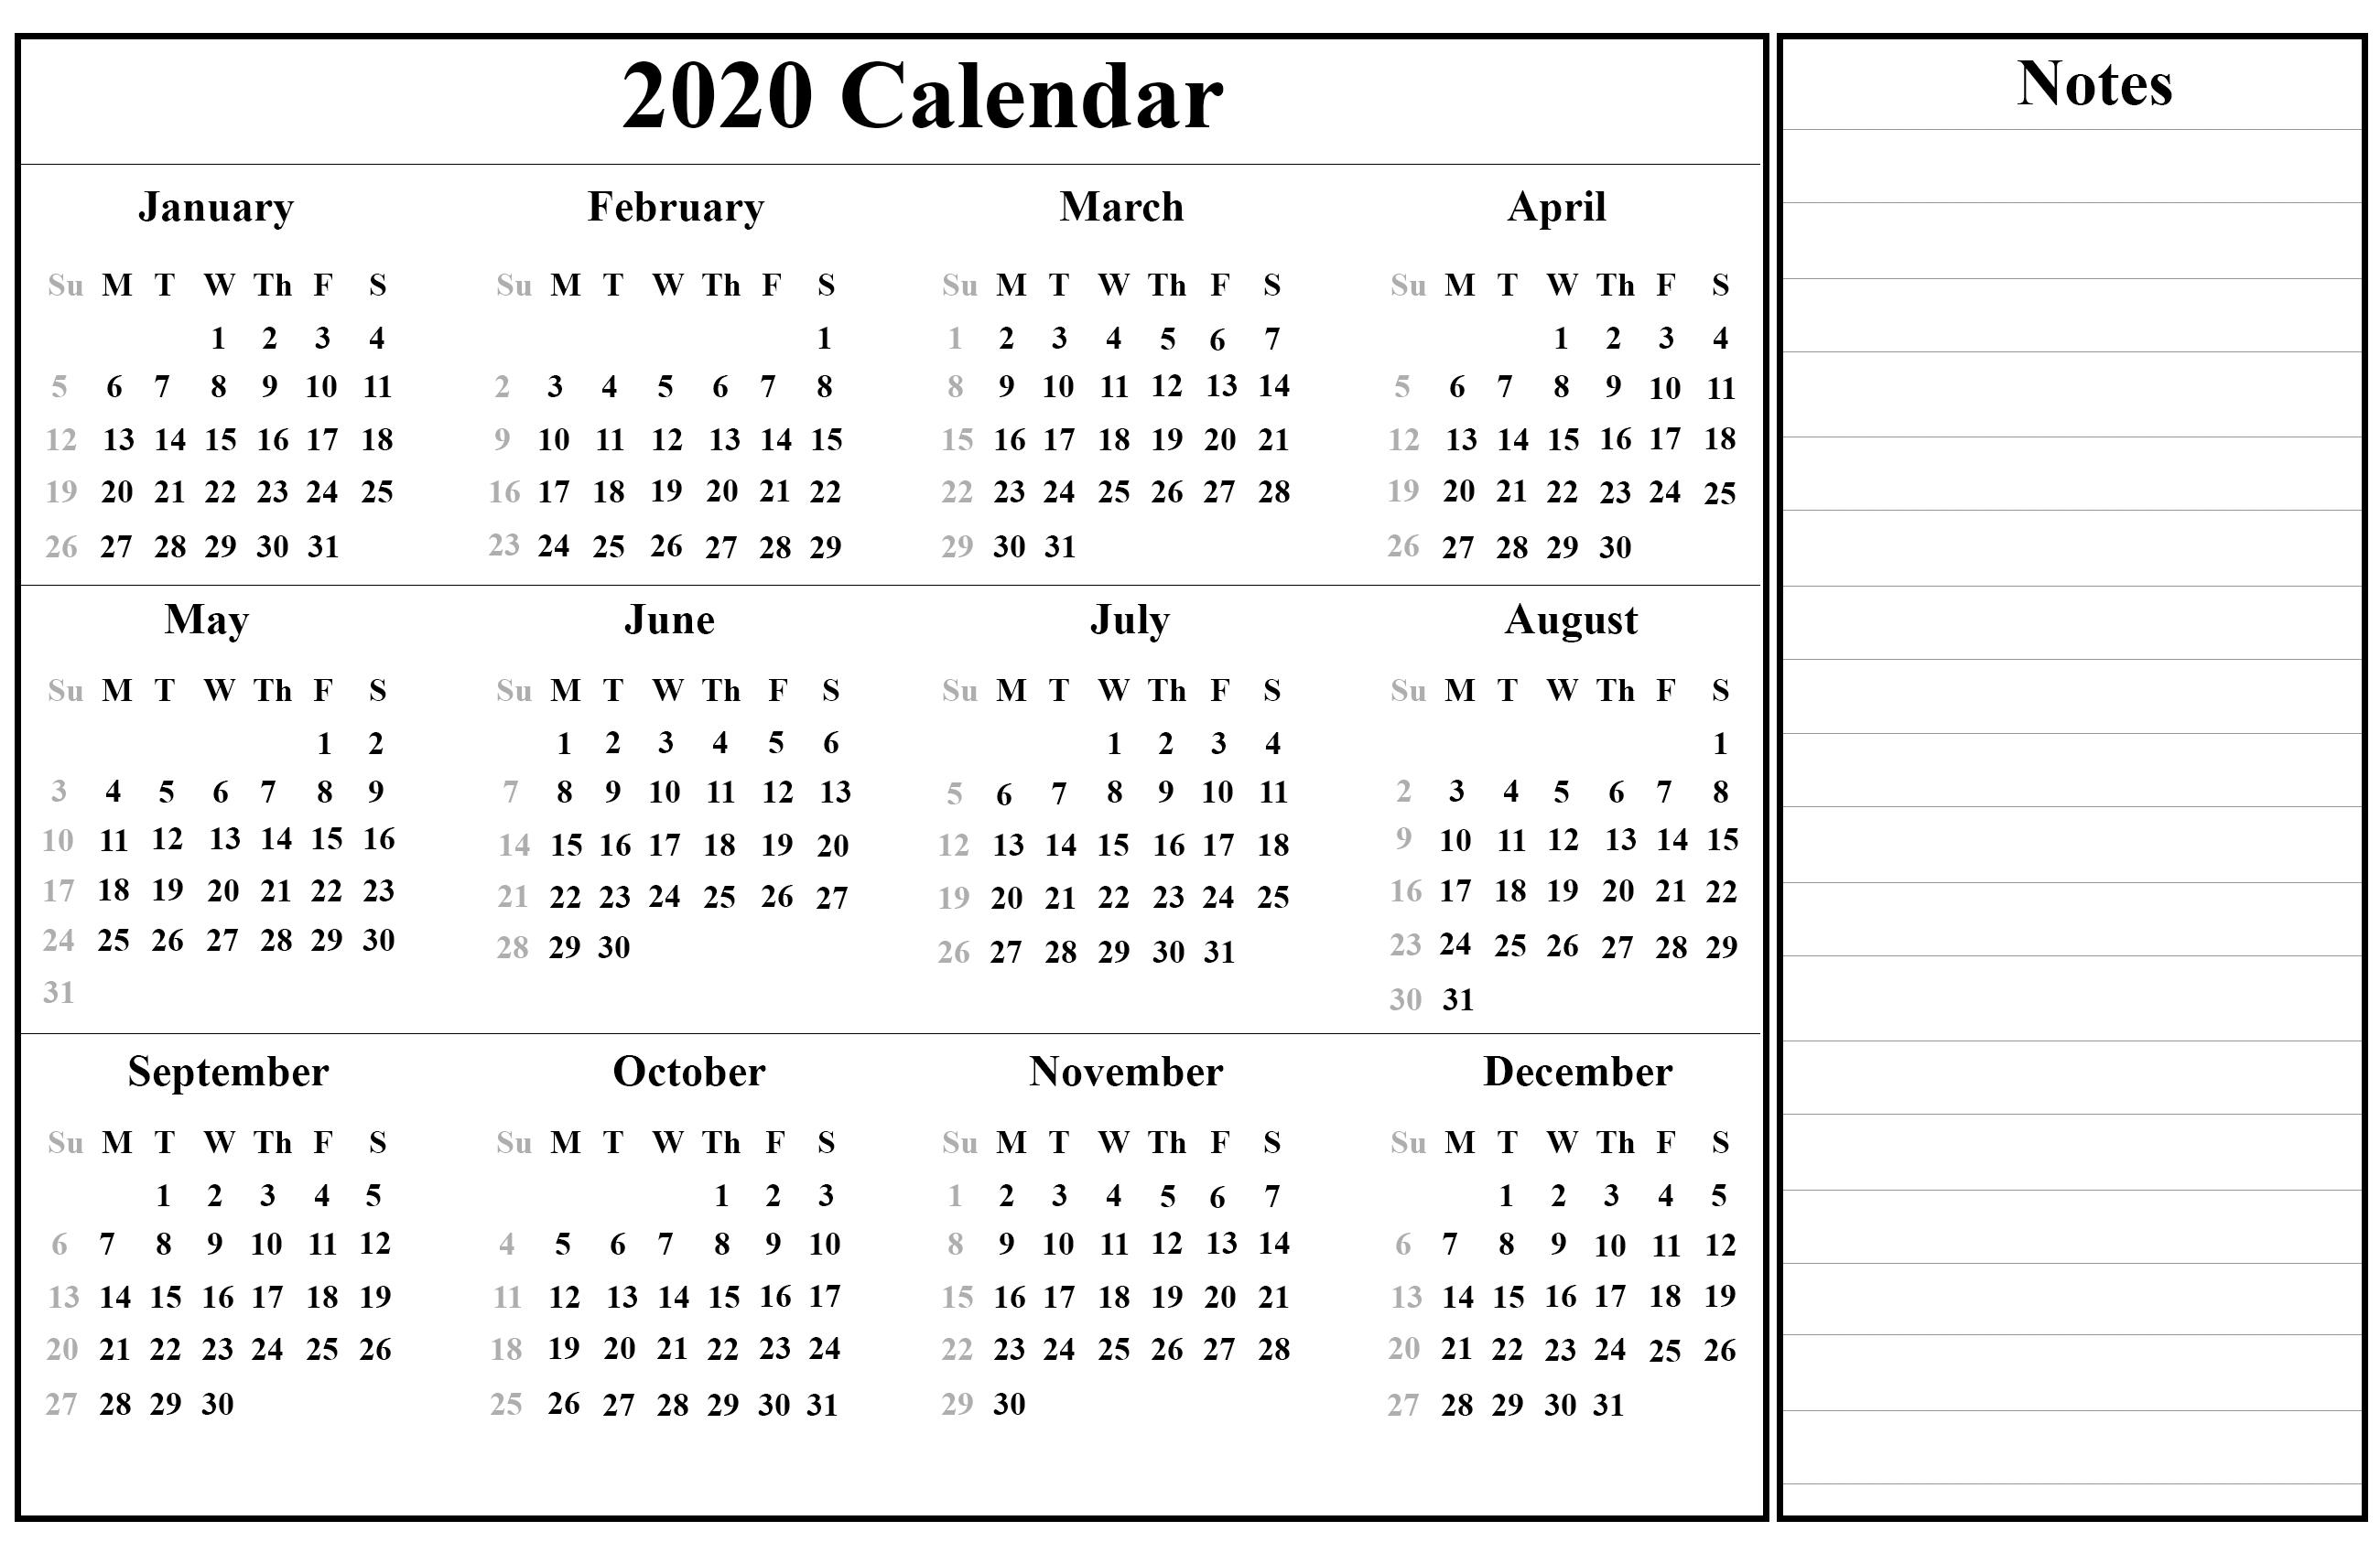 Free Printable Australia Calendar 2020 In Pdf, Excel & Word  July 2020 To June 2020 Australia Calendar